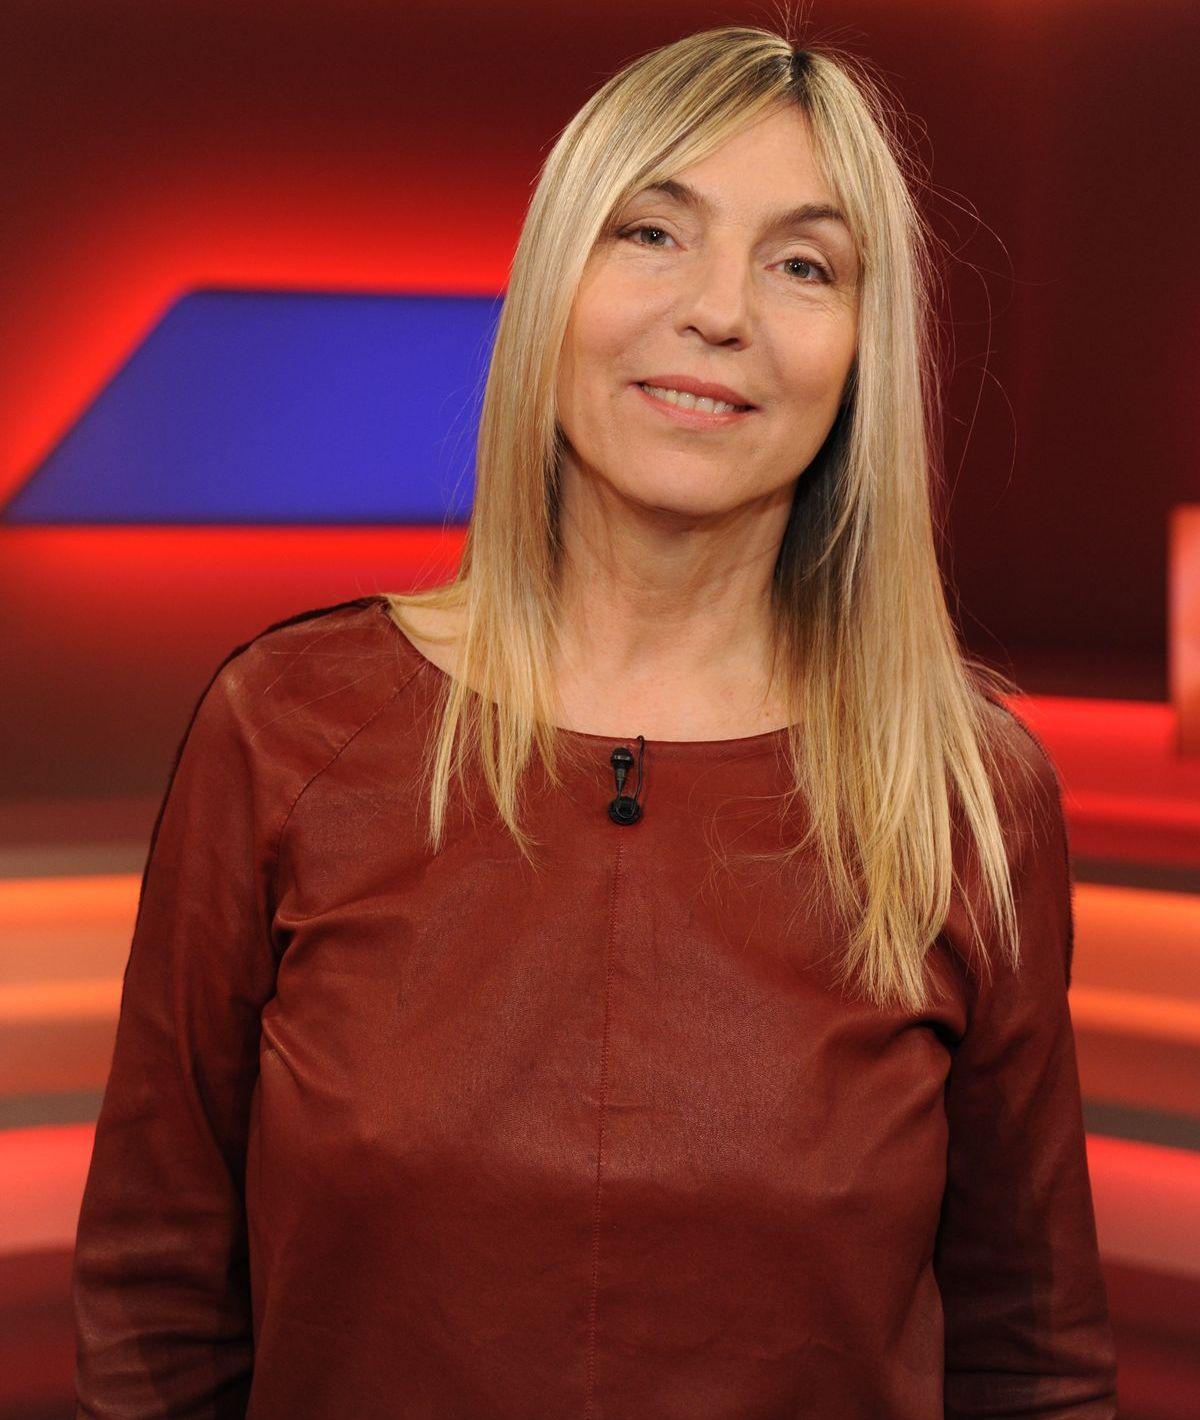 Tanja Valérien (ddp images)